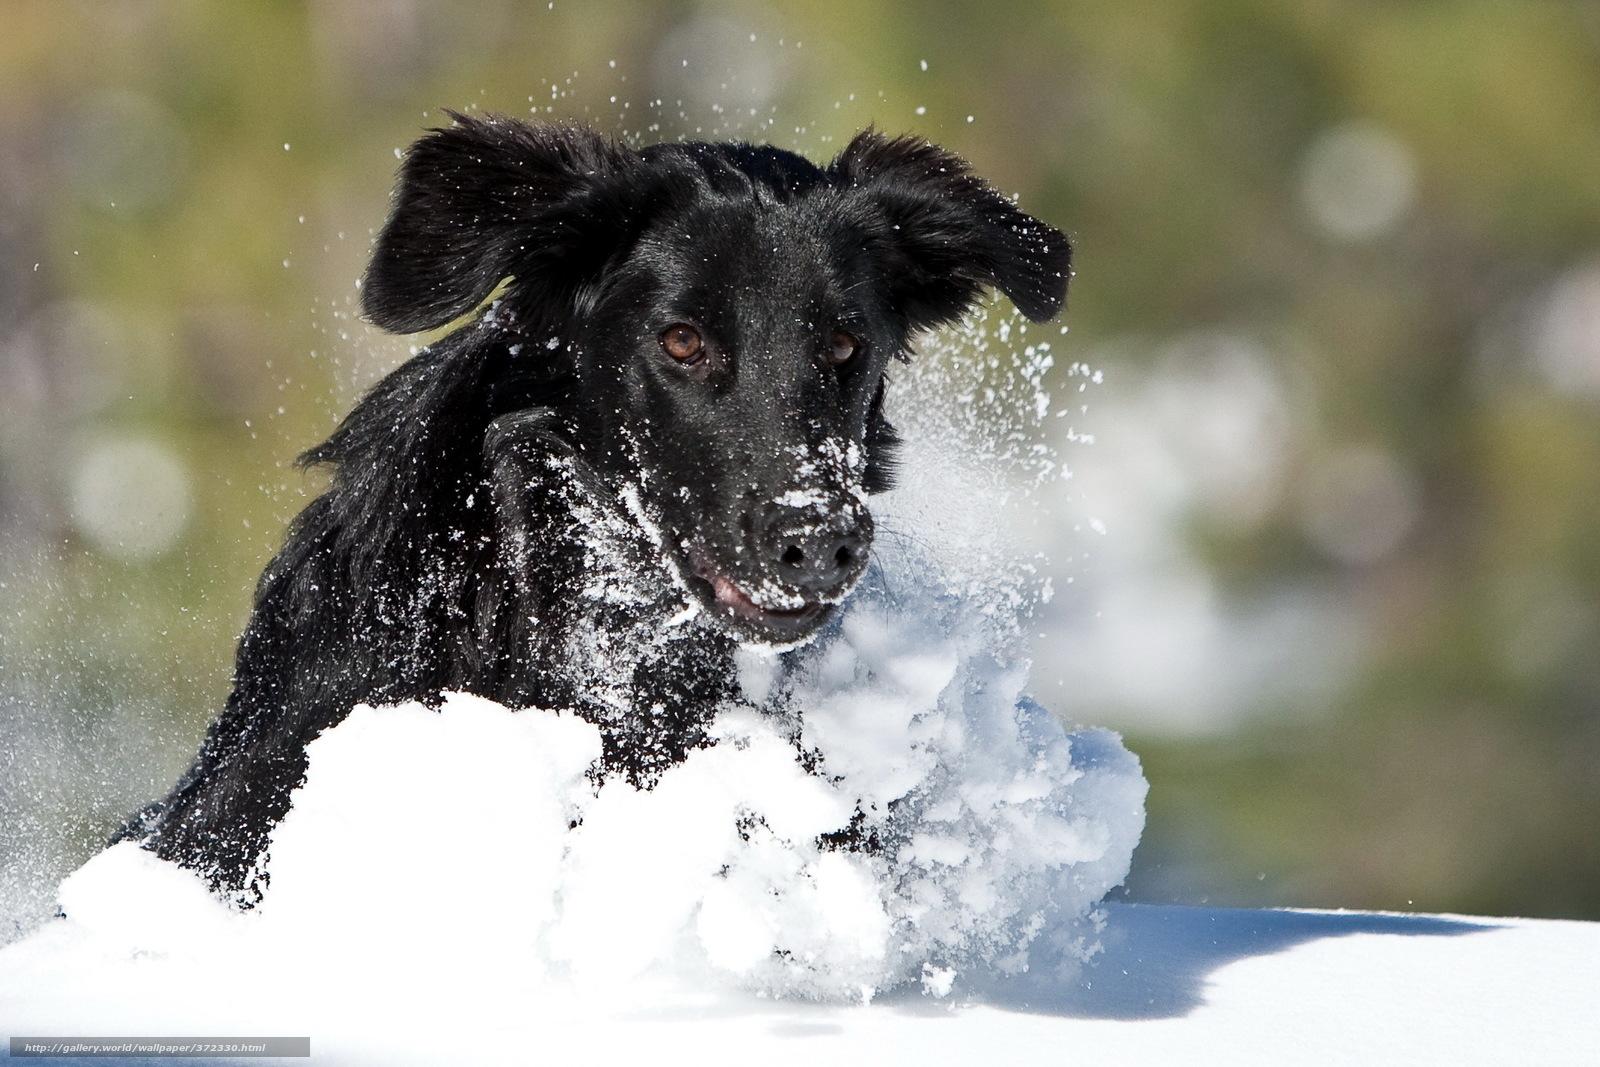 Download wallpaper dog, Winter, snow, run free desktop wallpaper in ...